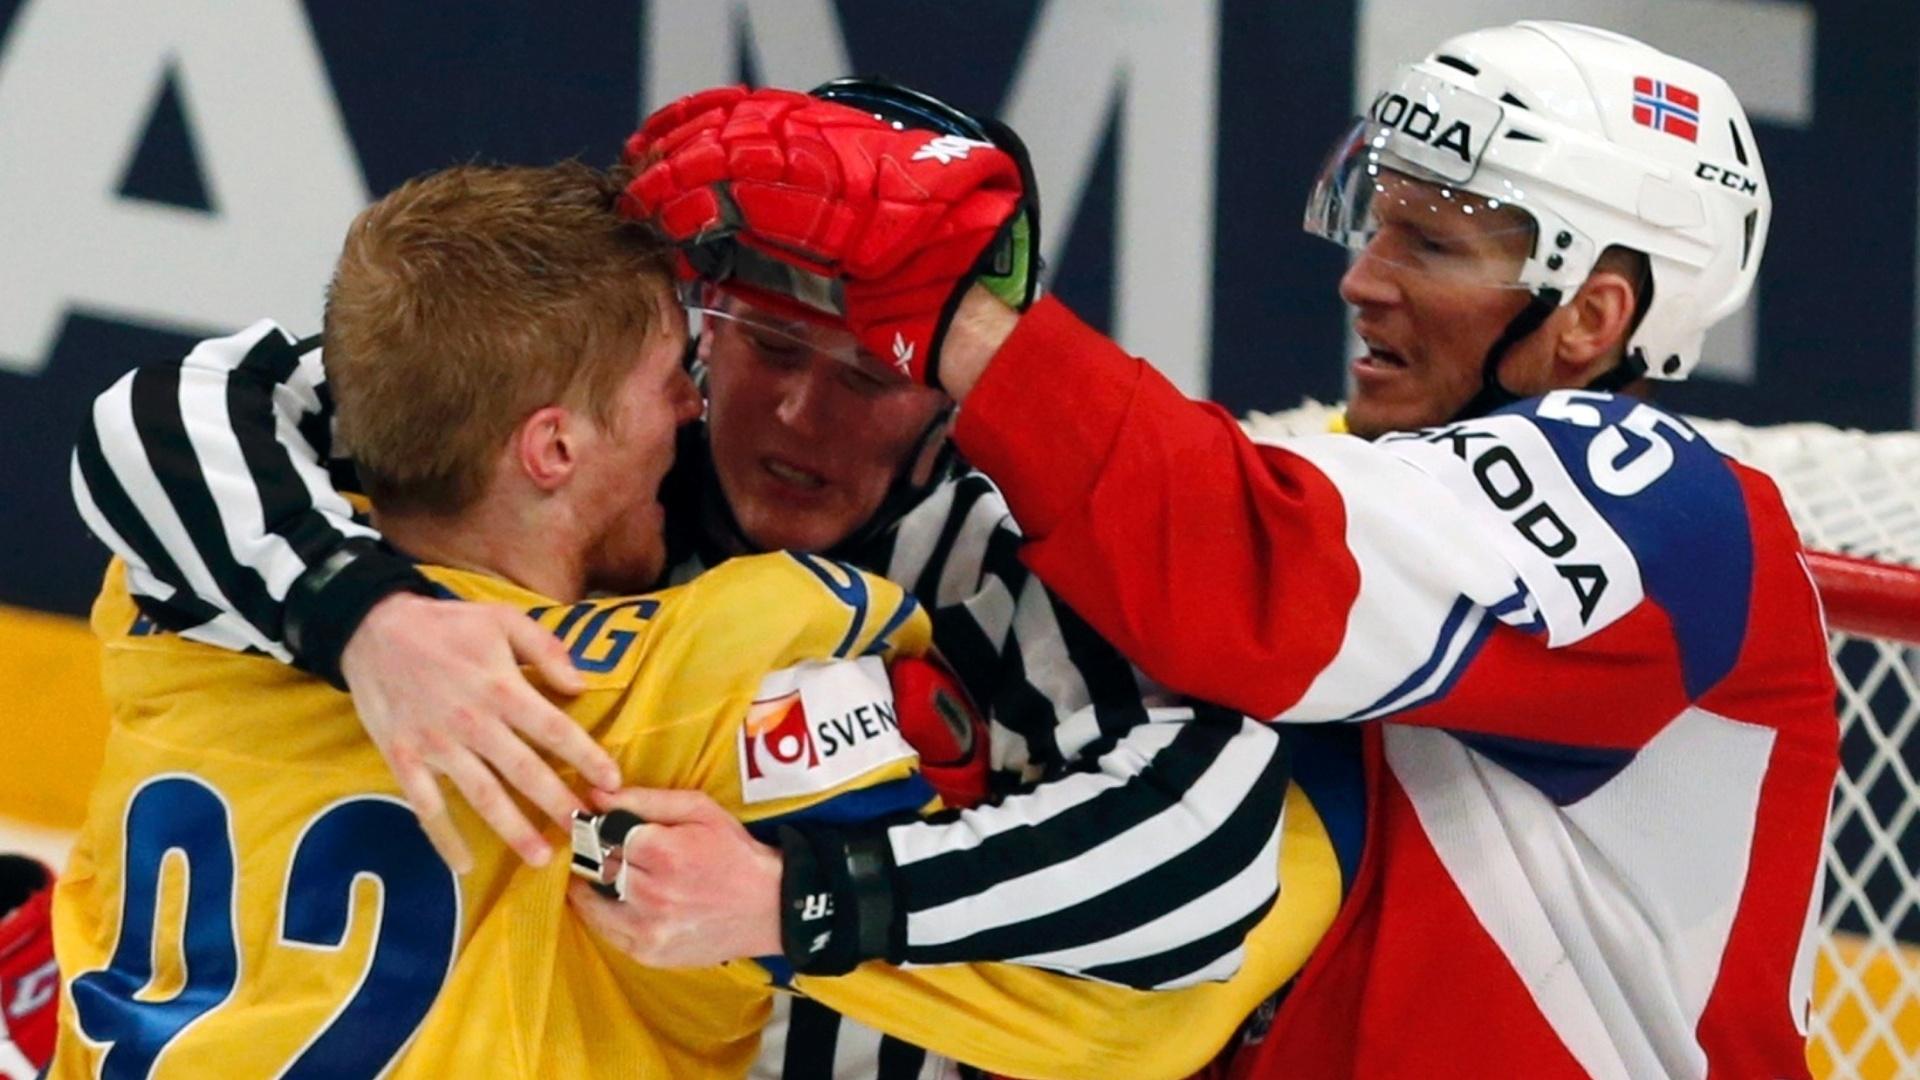 08.mai.2013 - Árbitro tenta separar briga entre Gabriel Landeskog (esq), da Suécia, e Ole-Kristian Tollefsen, da Noruega, durante partida pelo Mundial de hóquei no gelo